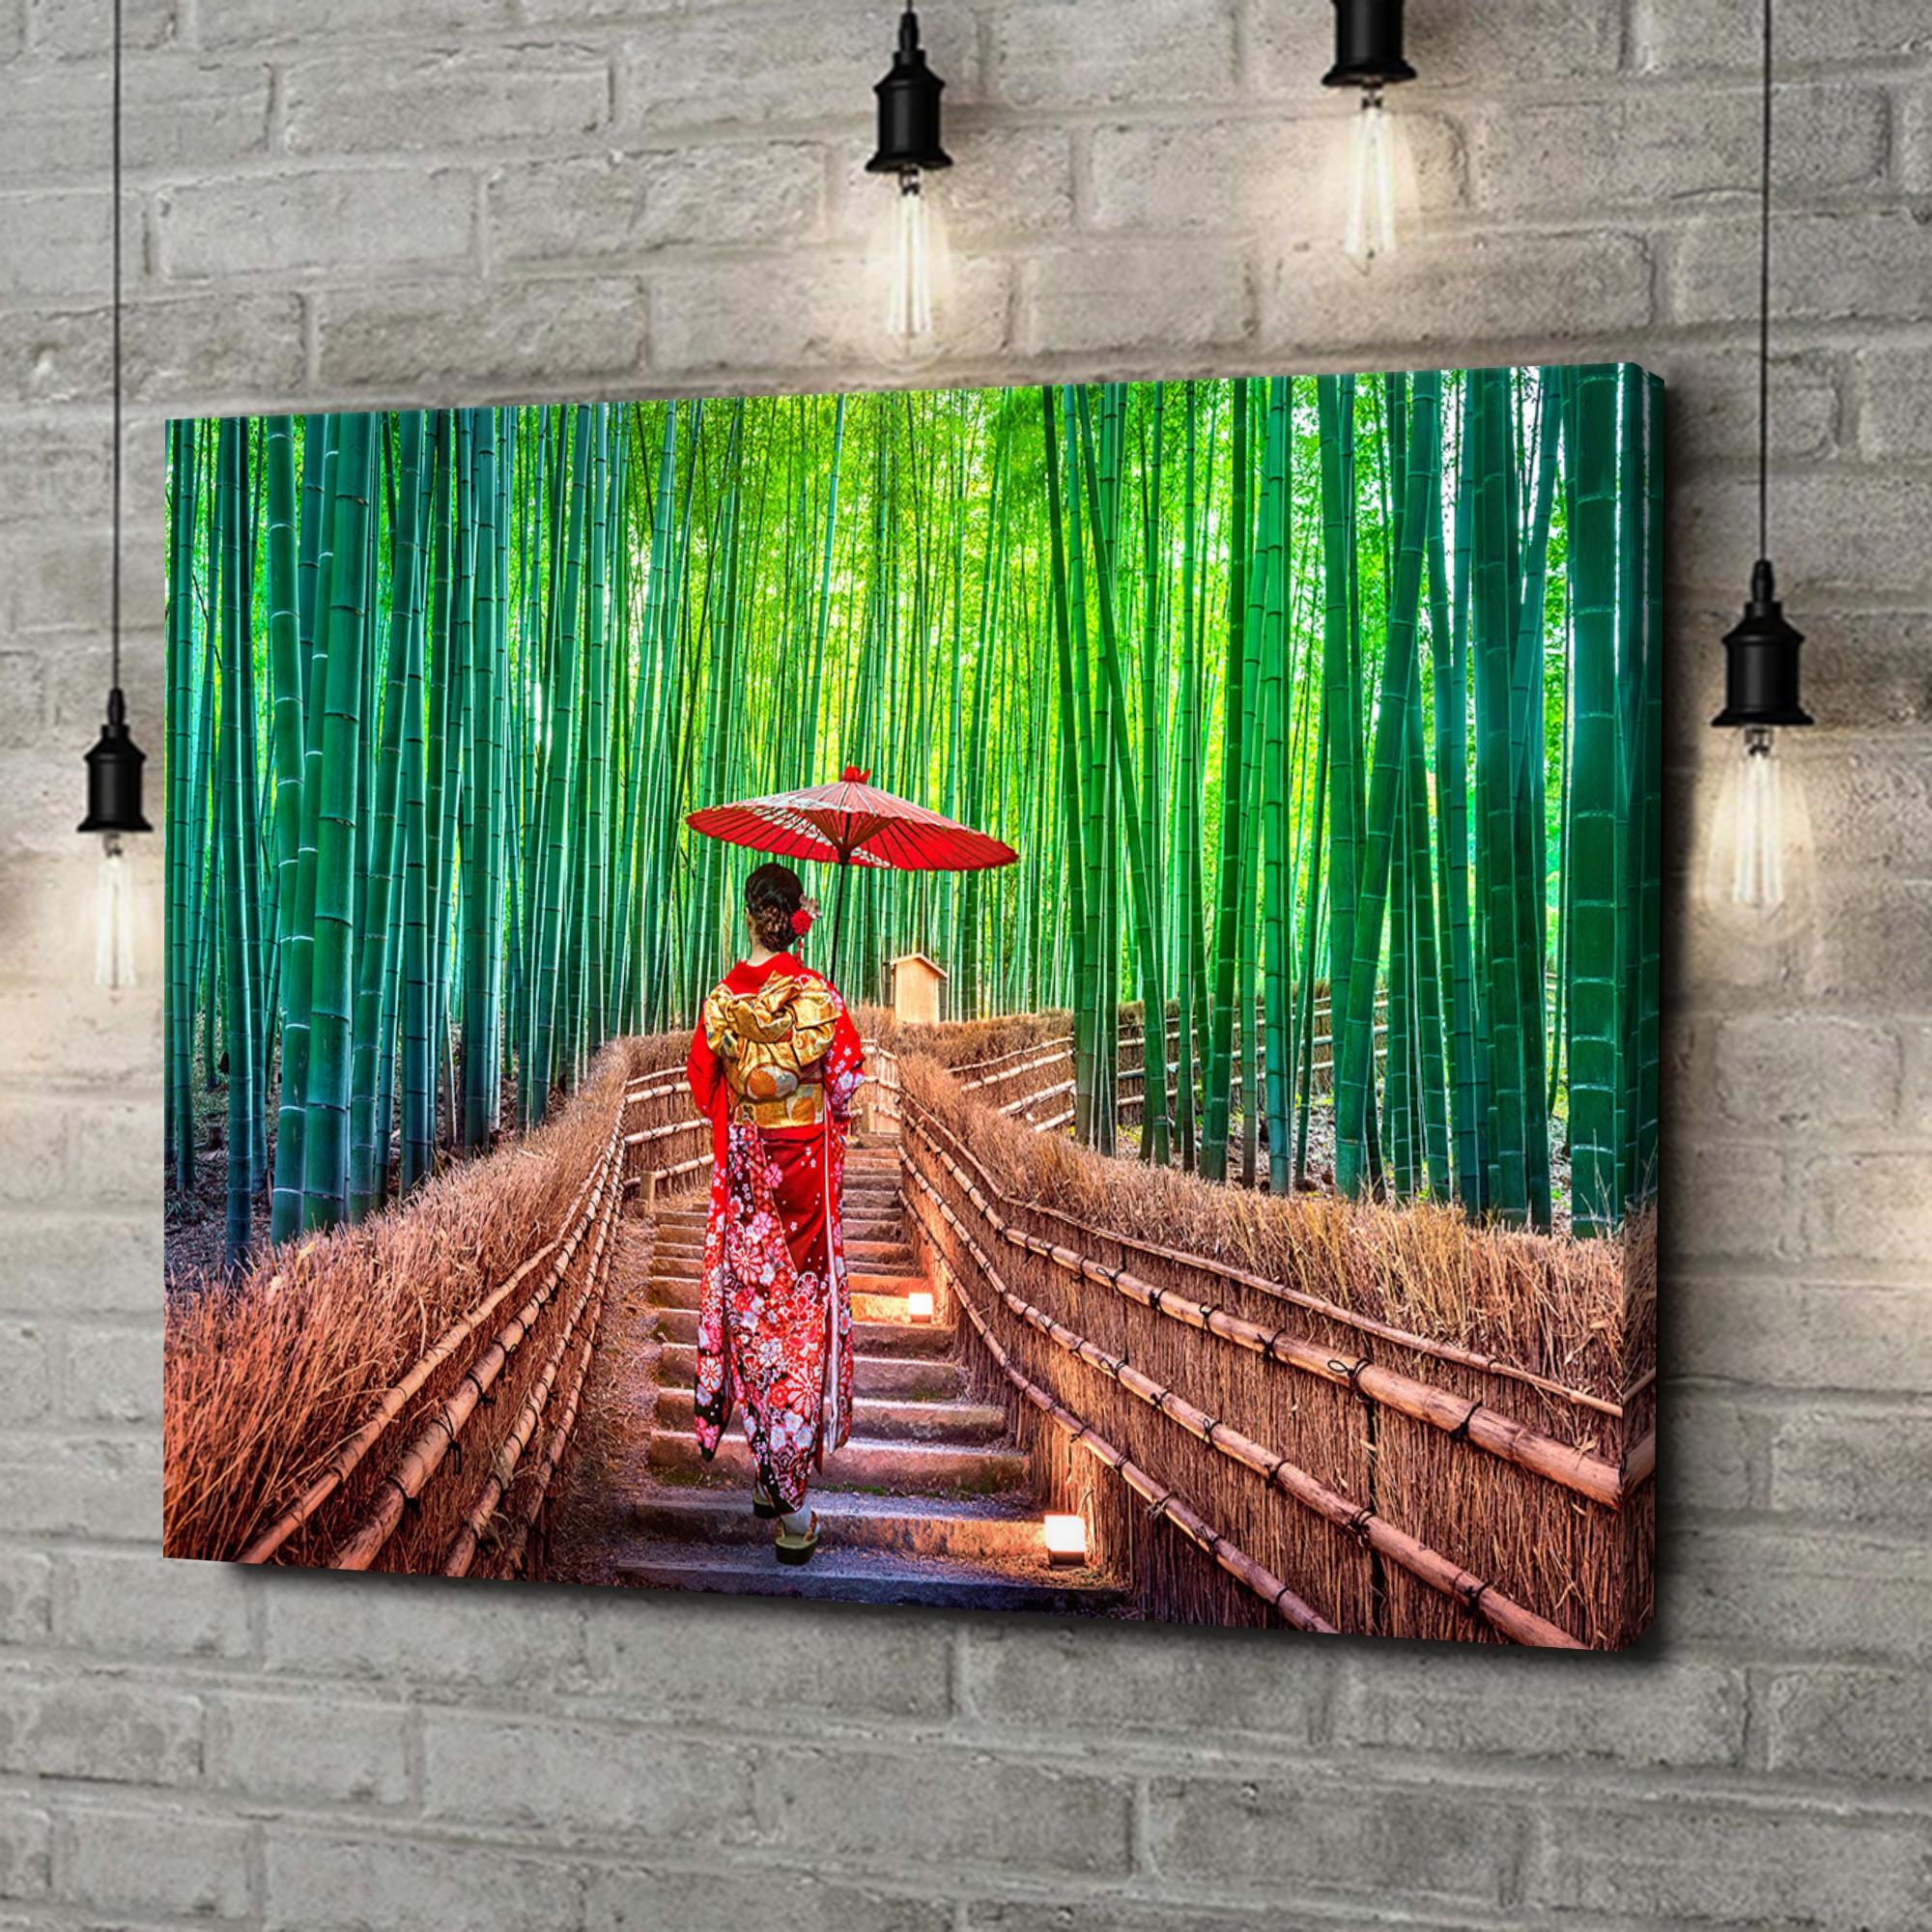 Leinwandbild personalisiert Bambuswald